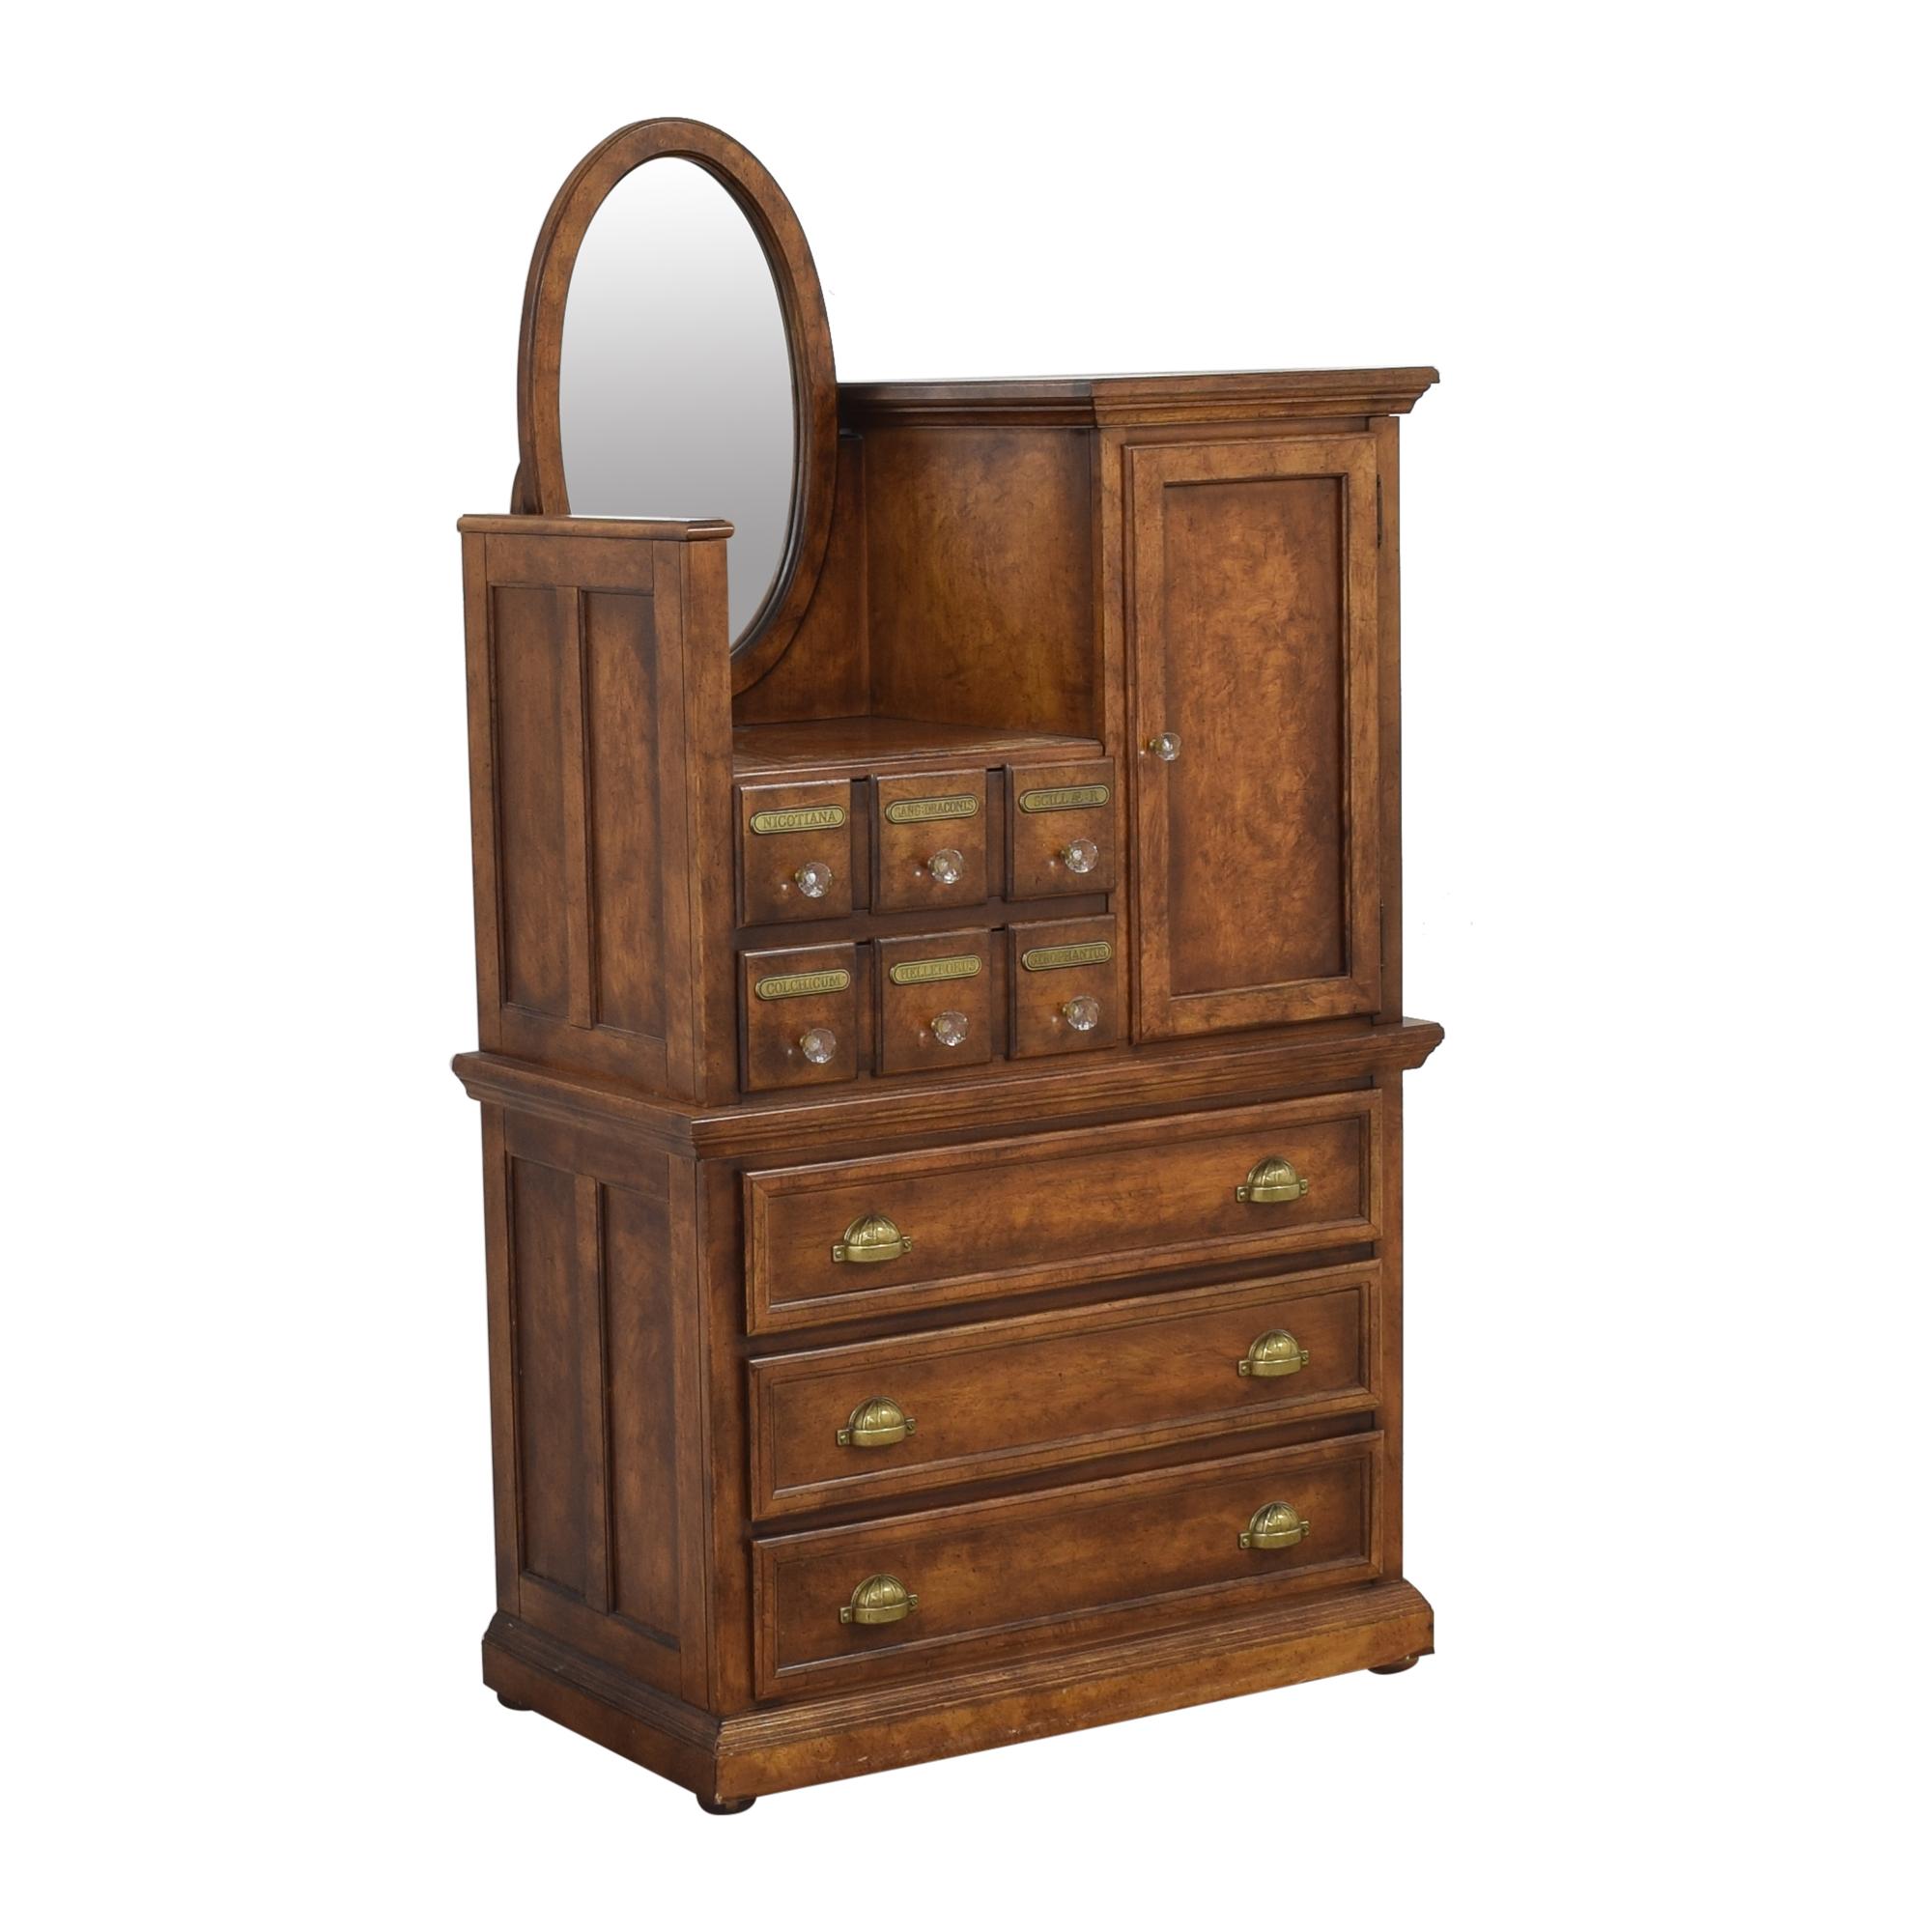 Antique Apothecary Wardrobe with Mirror Storage